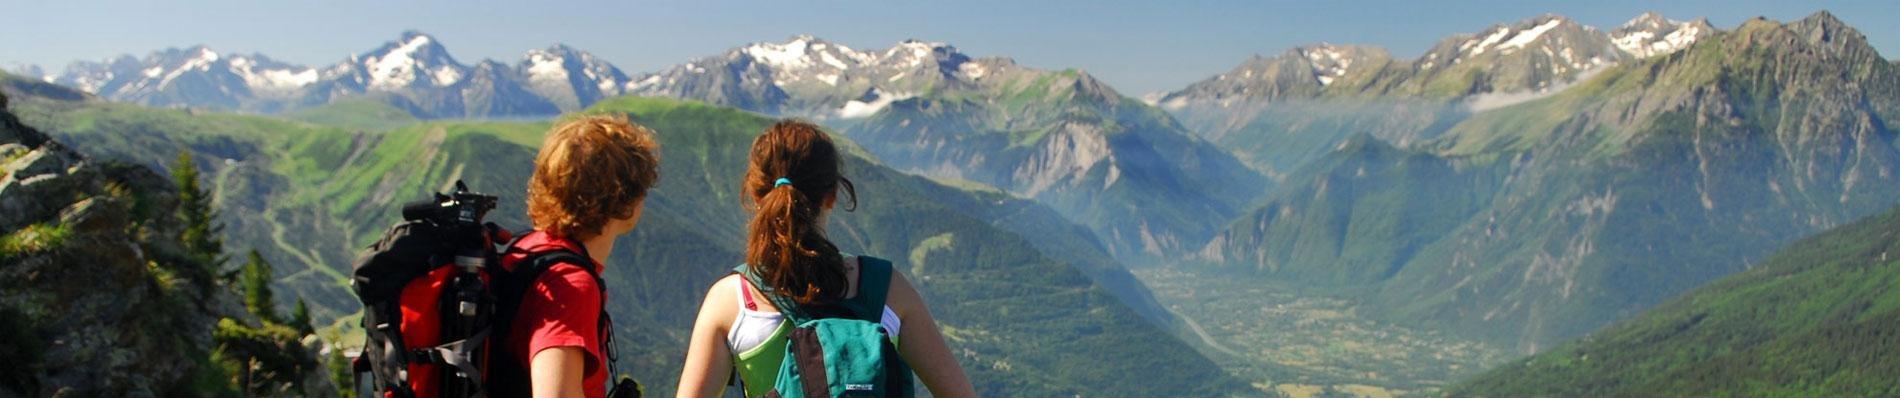 bergen oz en oisans chalet des nieges alpen fietsen